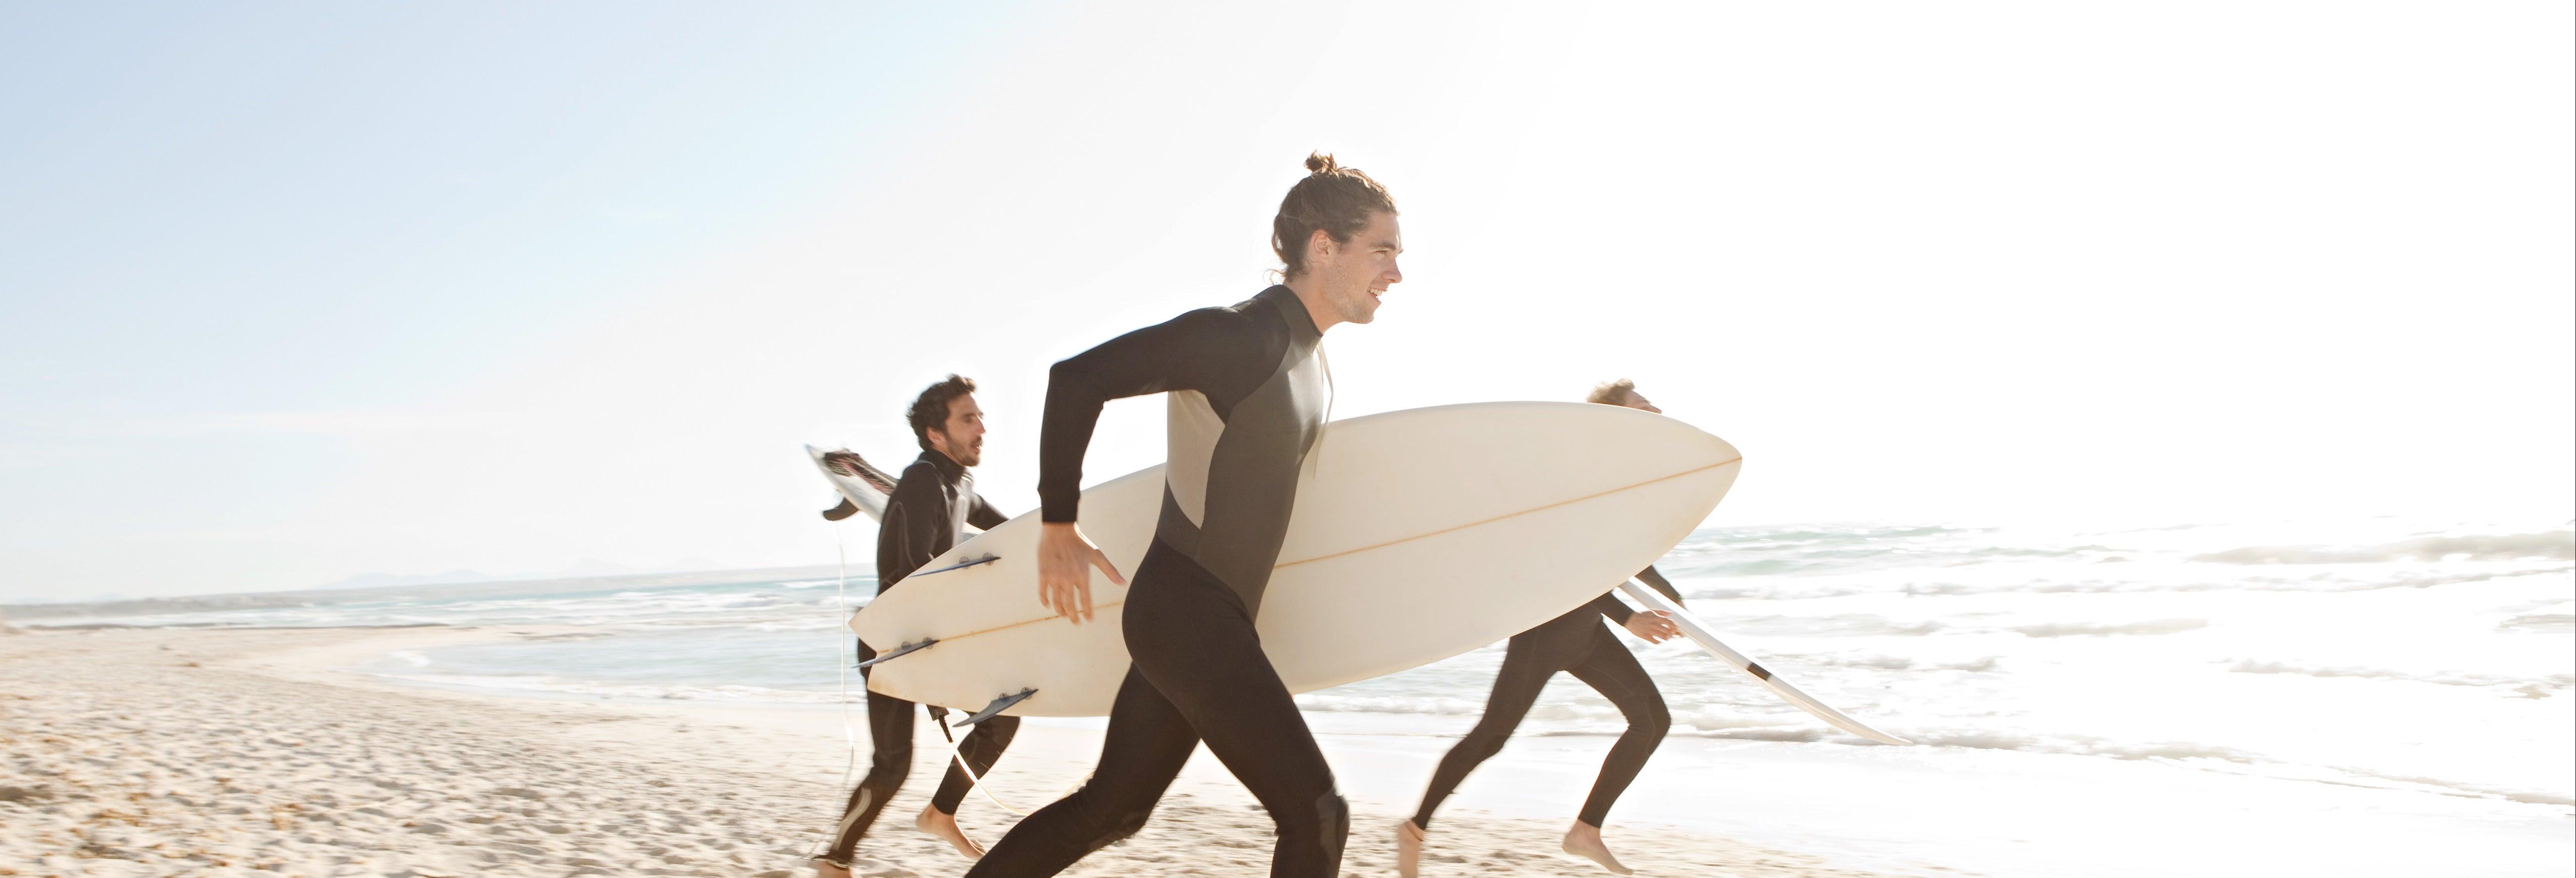 Galé Beach Surf School